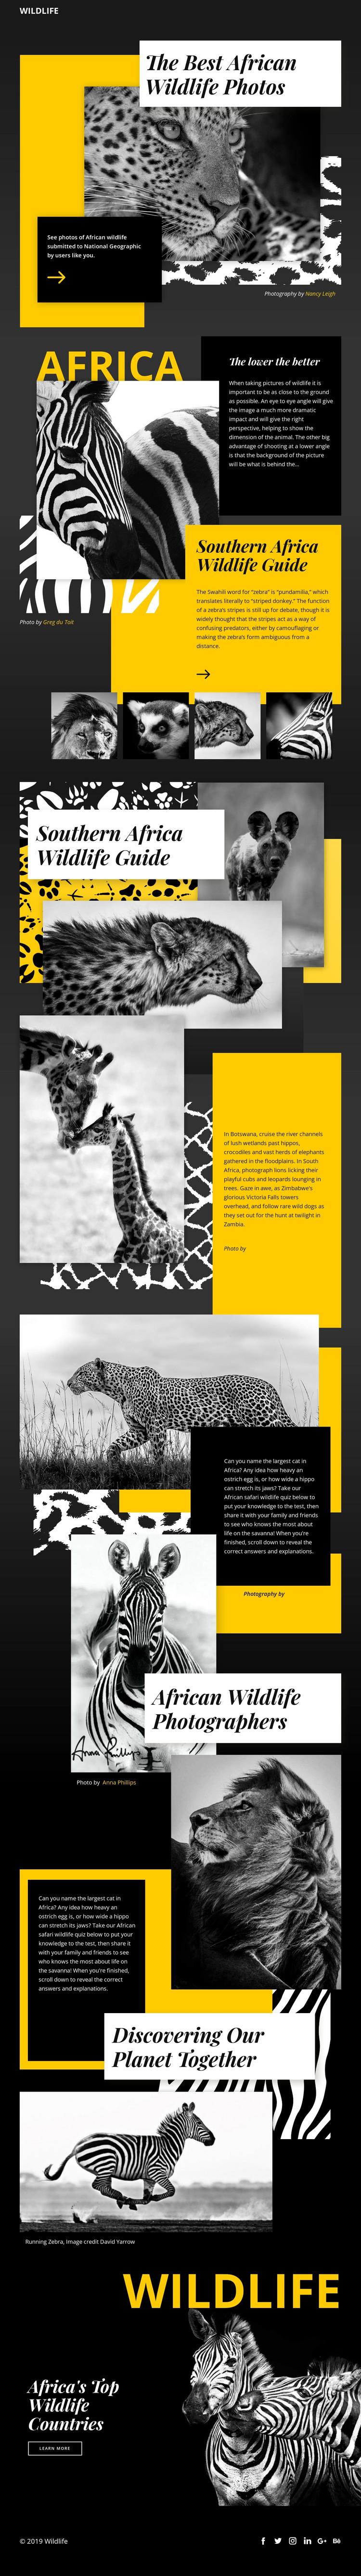 Wildlife Photos Web Design